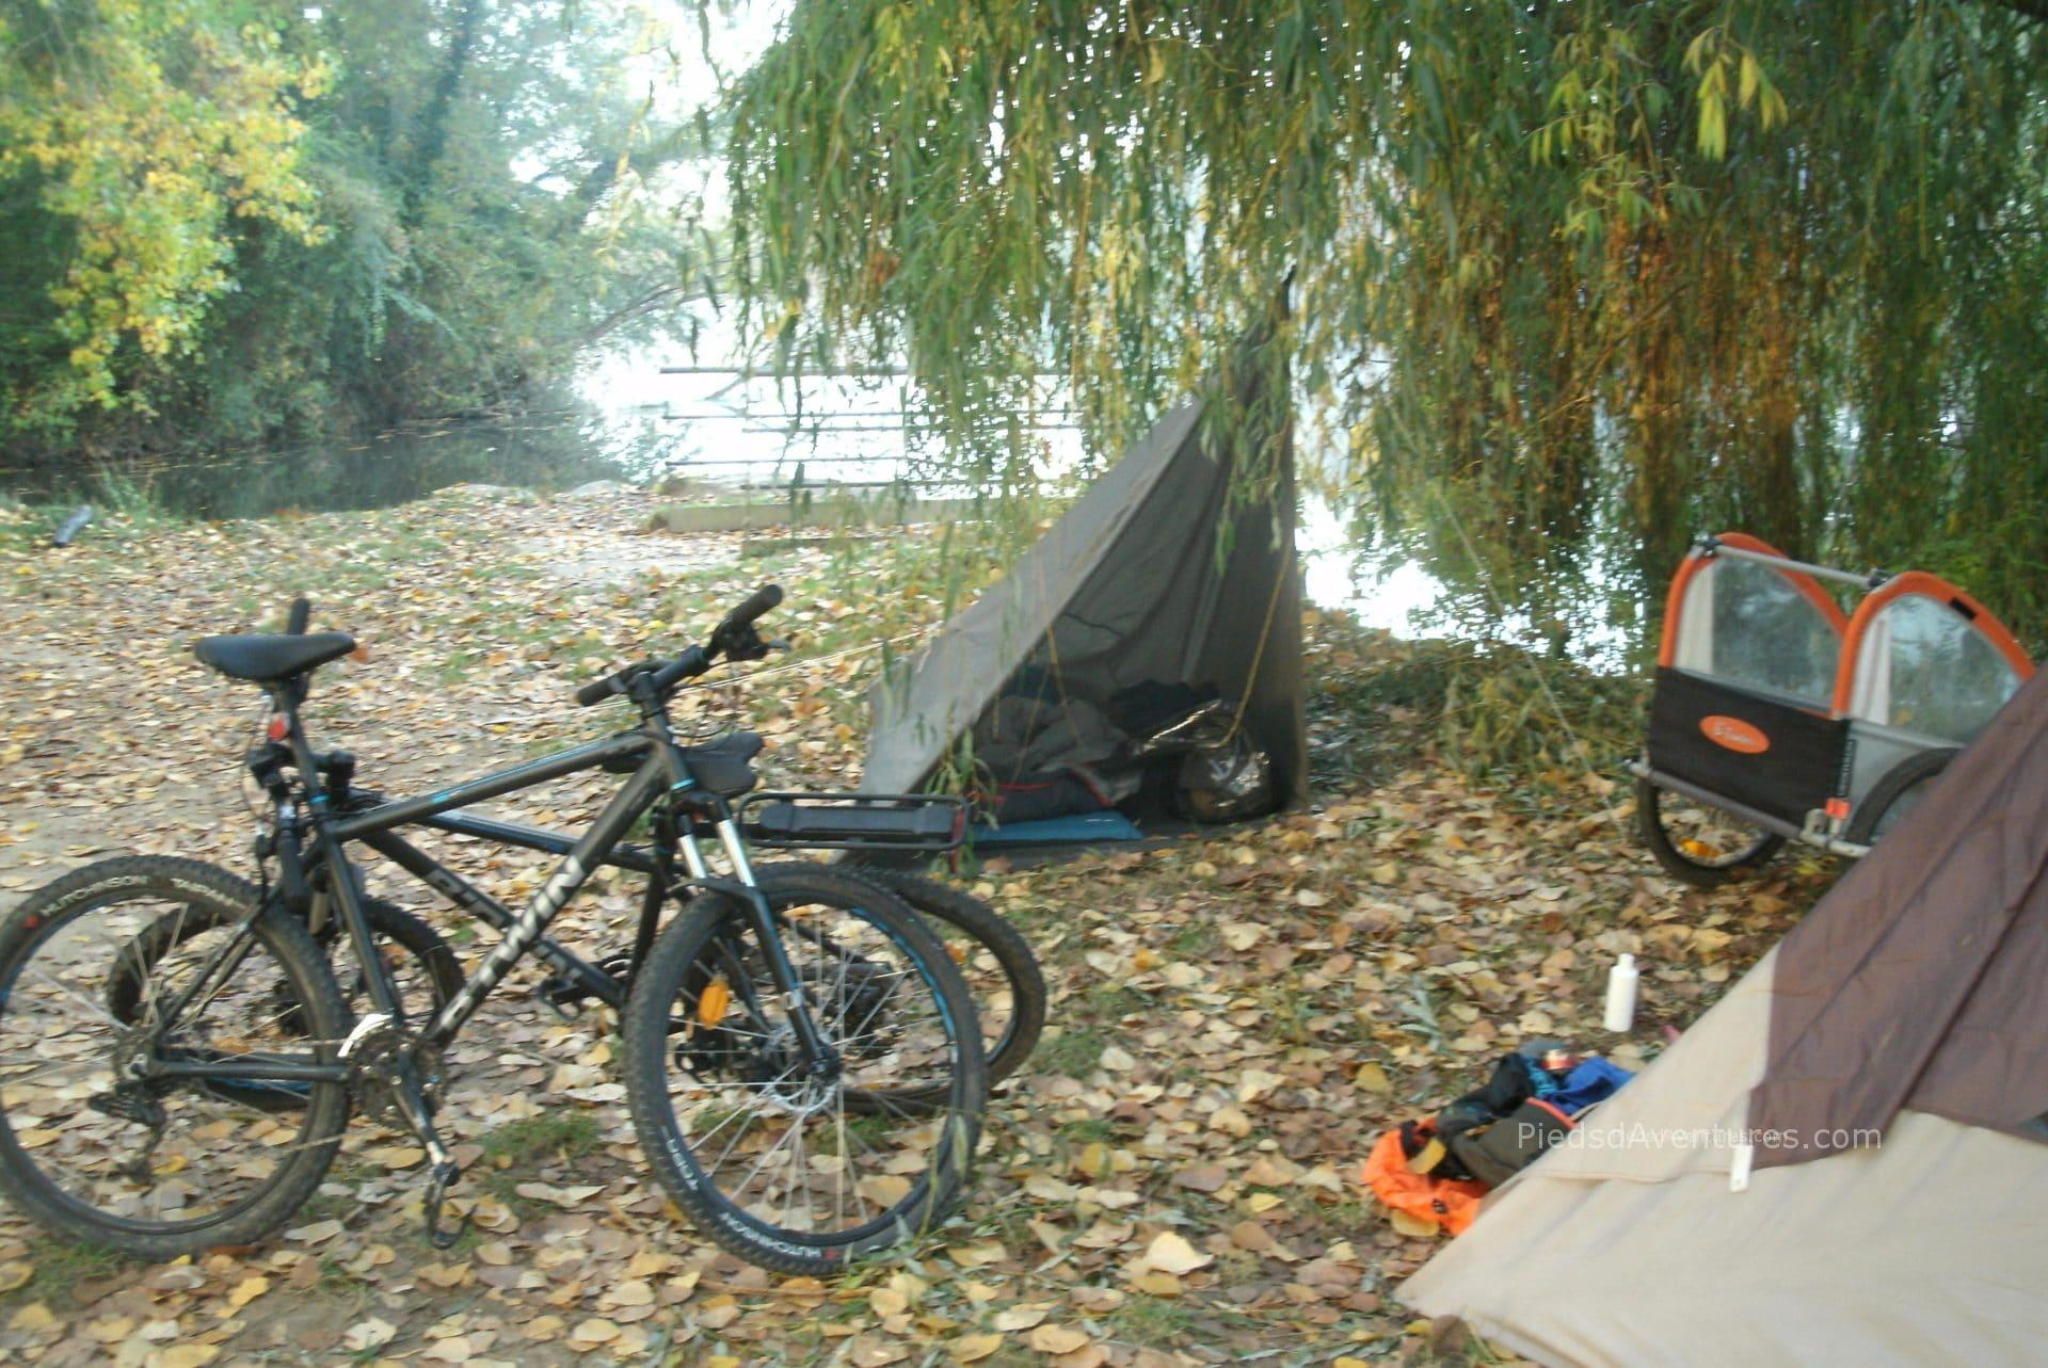 Randonnée à vélo ou VTT